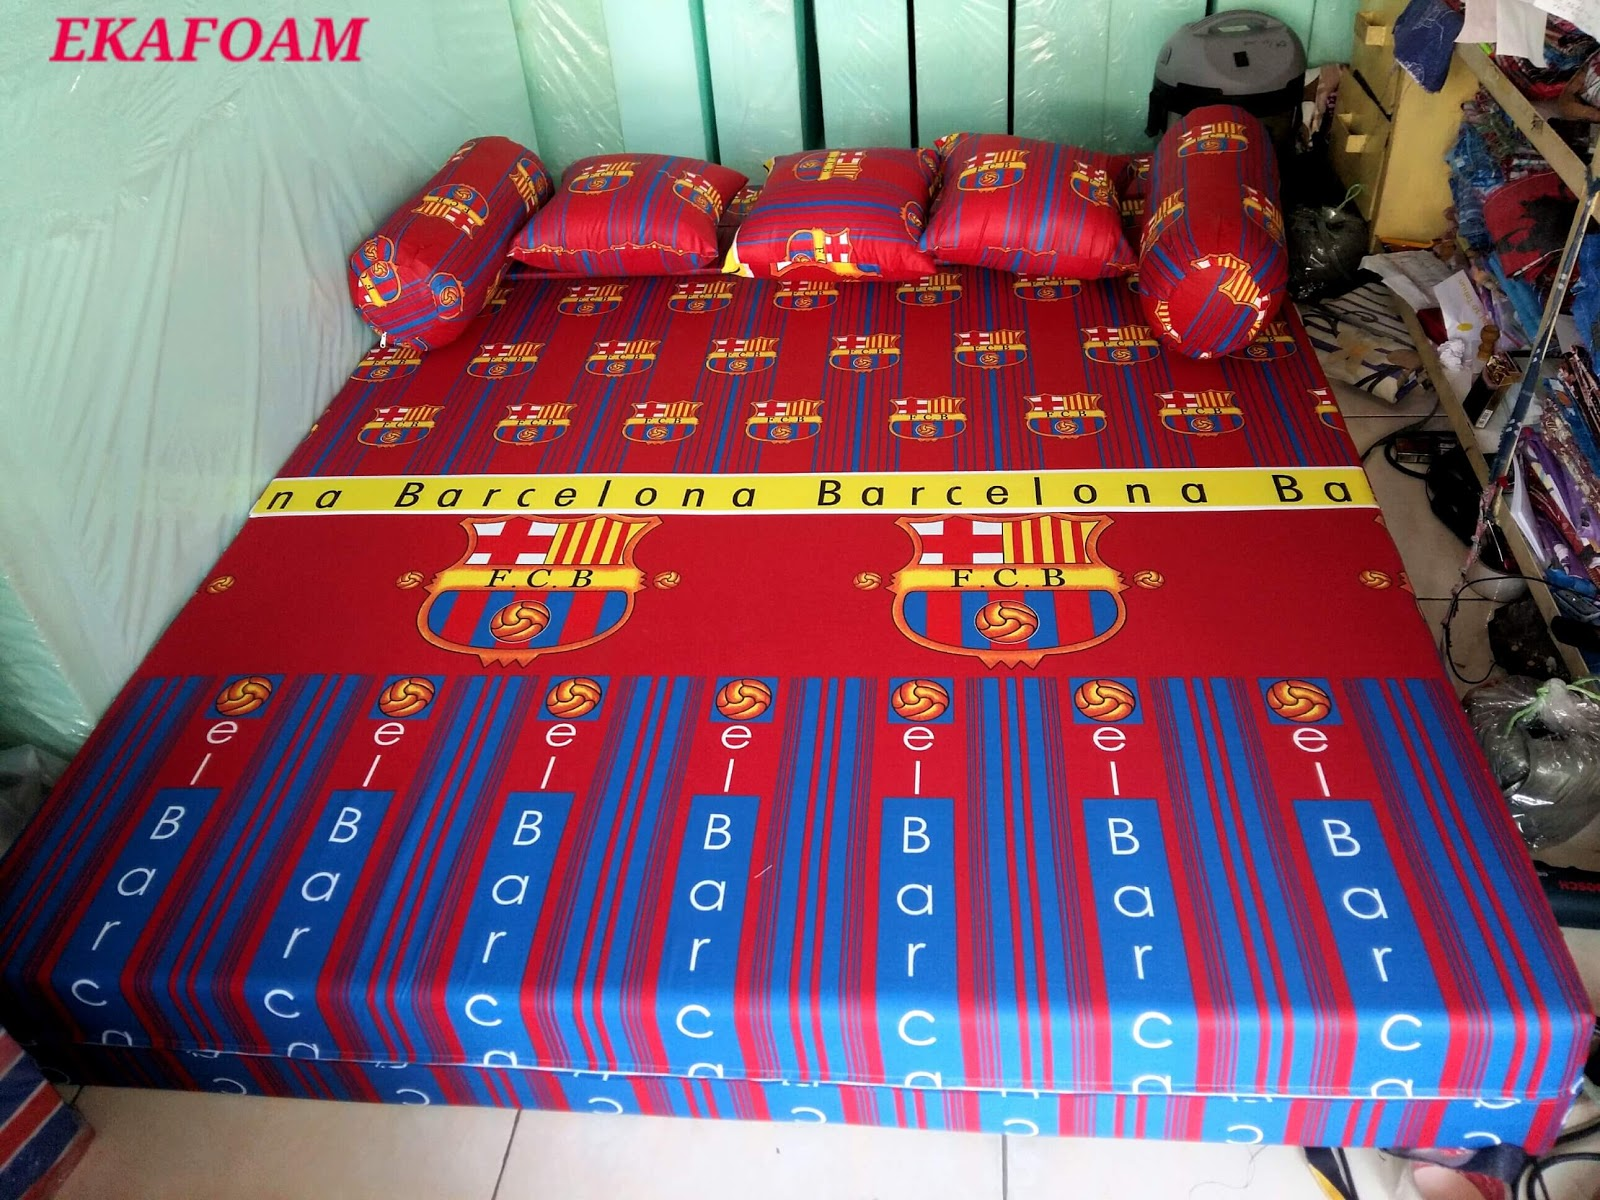 sofa bed inoac 3 in 1 100 inch slipcover 2017 full motif agen resmi kasur busa